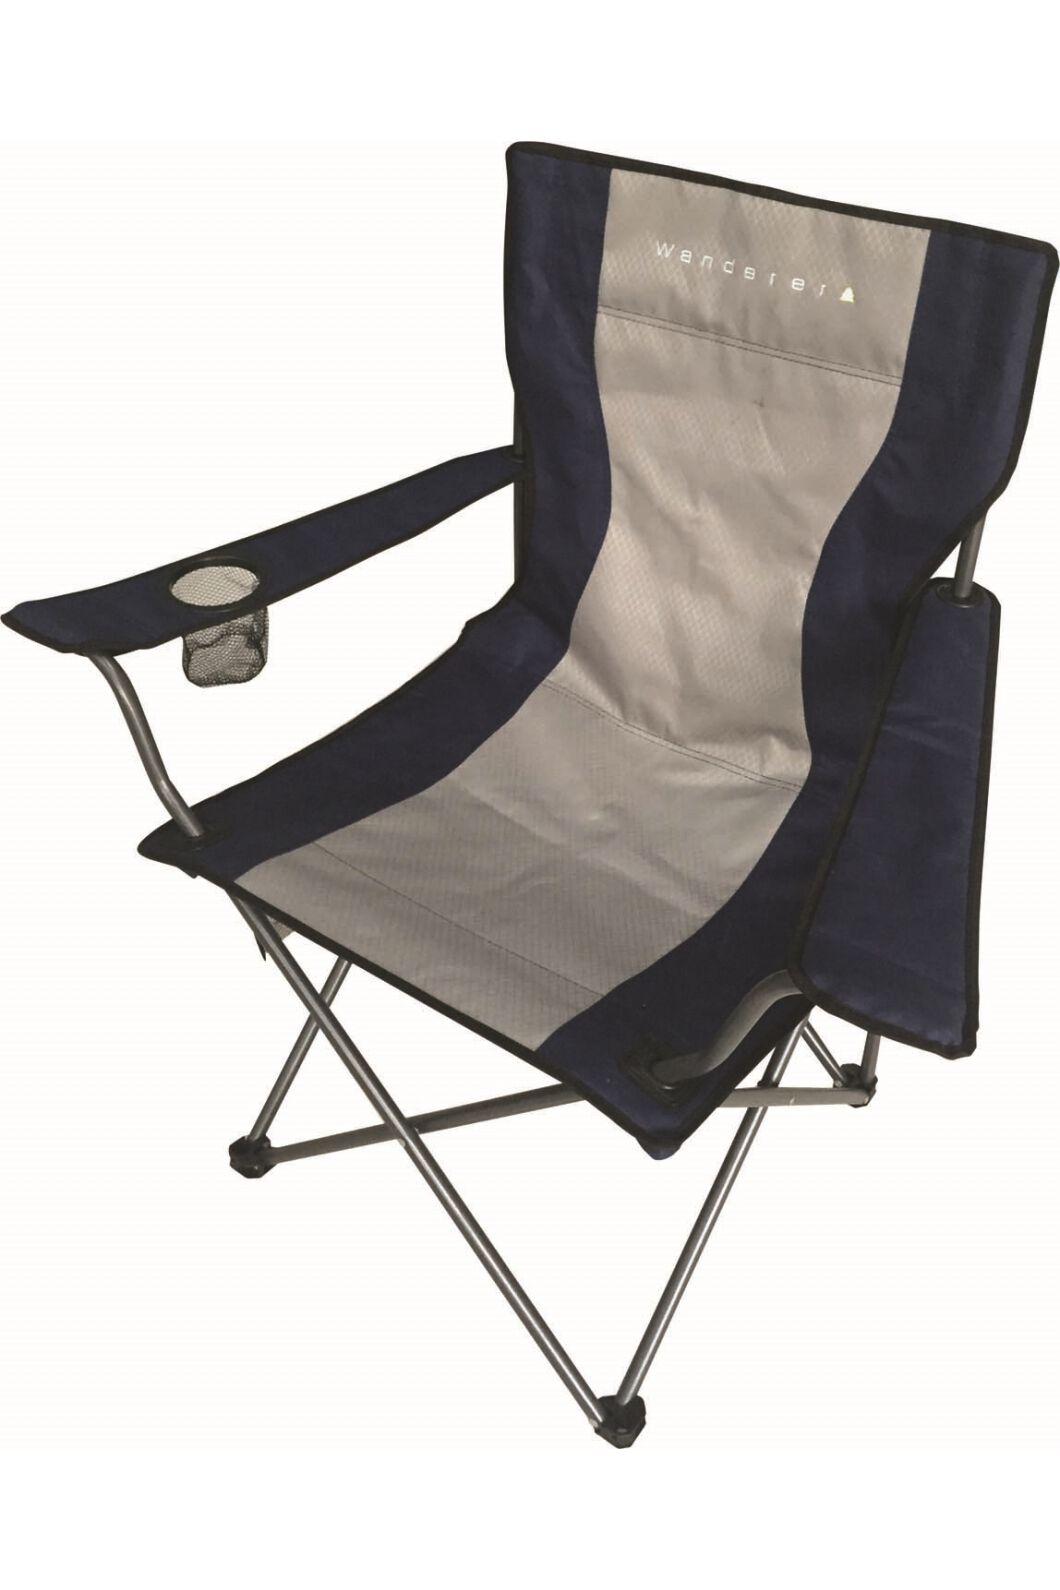 Wanderer Getaway Quad Fold Chair, None, hi-res